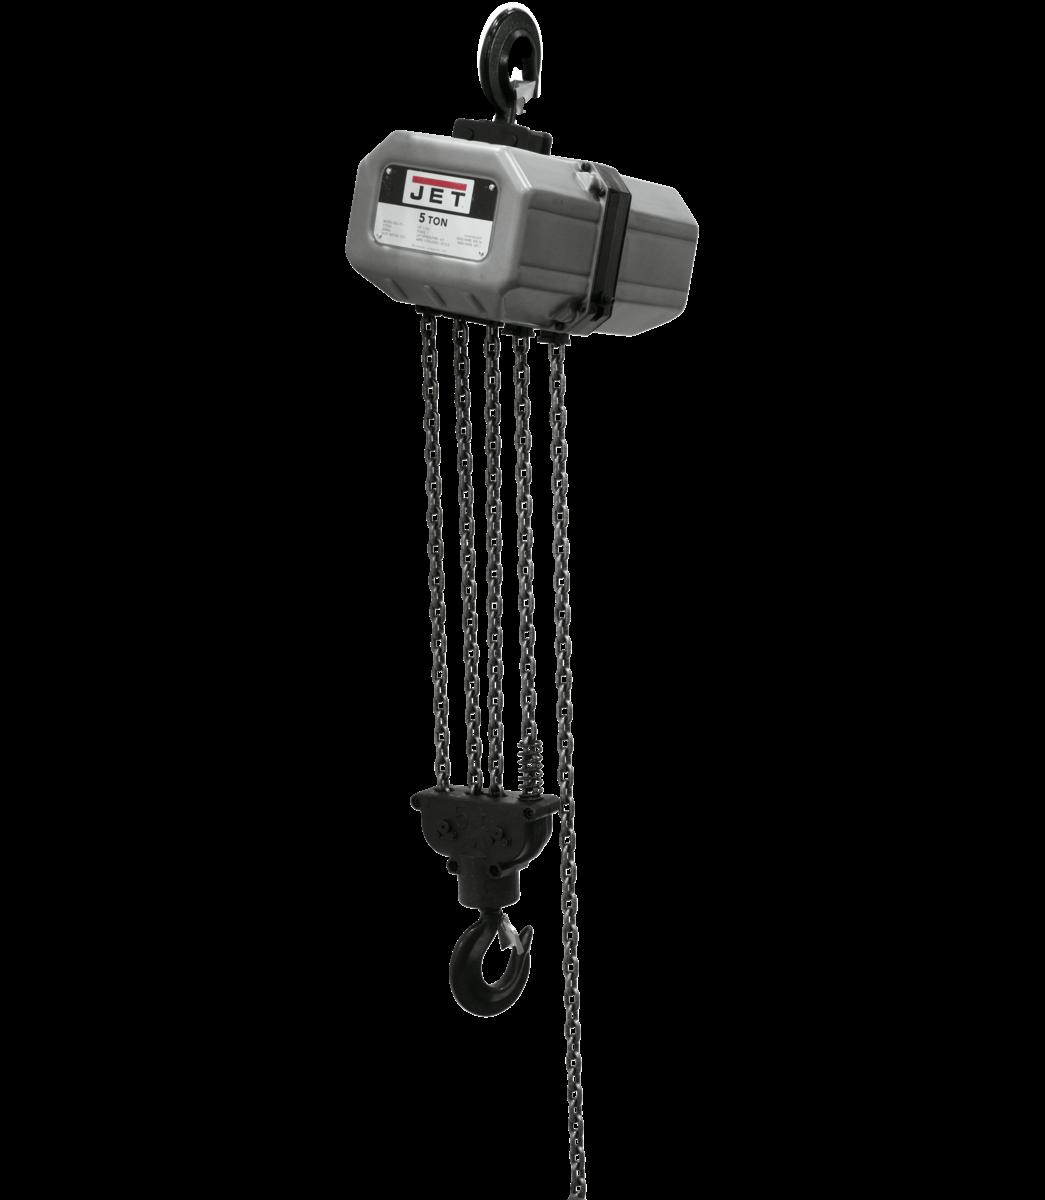 5SS-3C-15, 5-Ton Electric Chain Hoist 3-Phase 15' lift